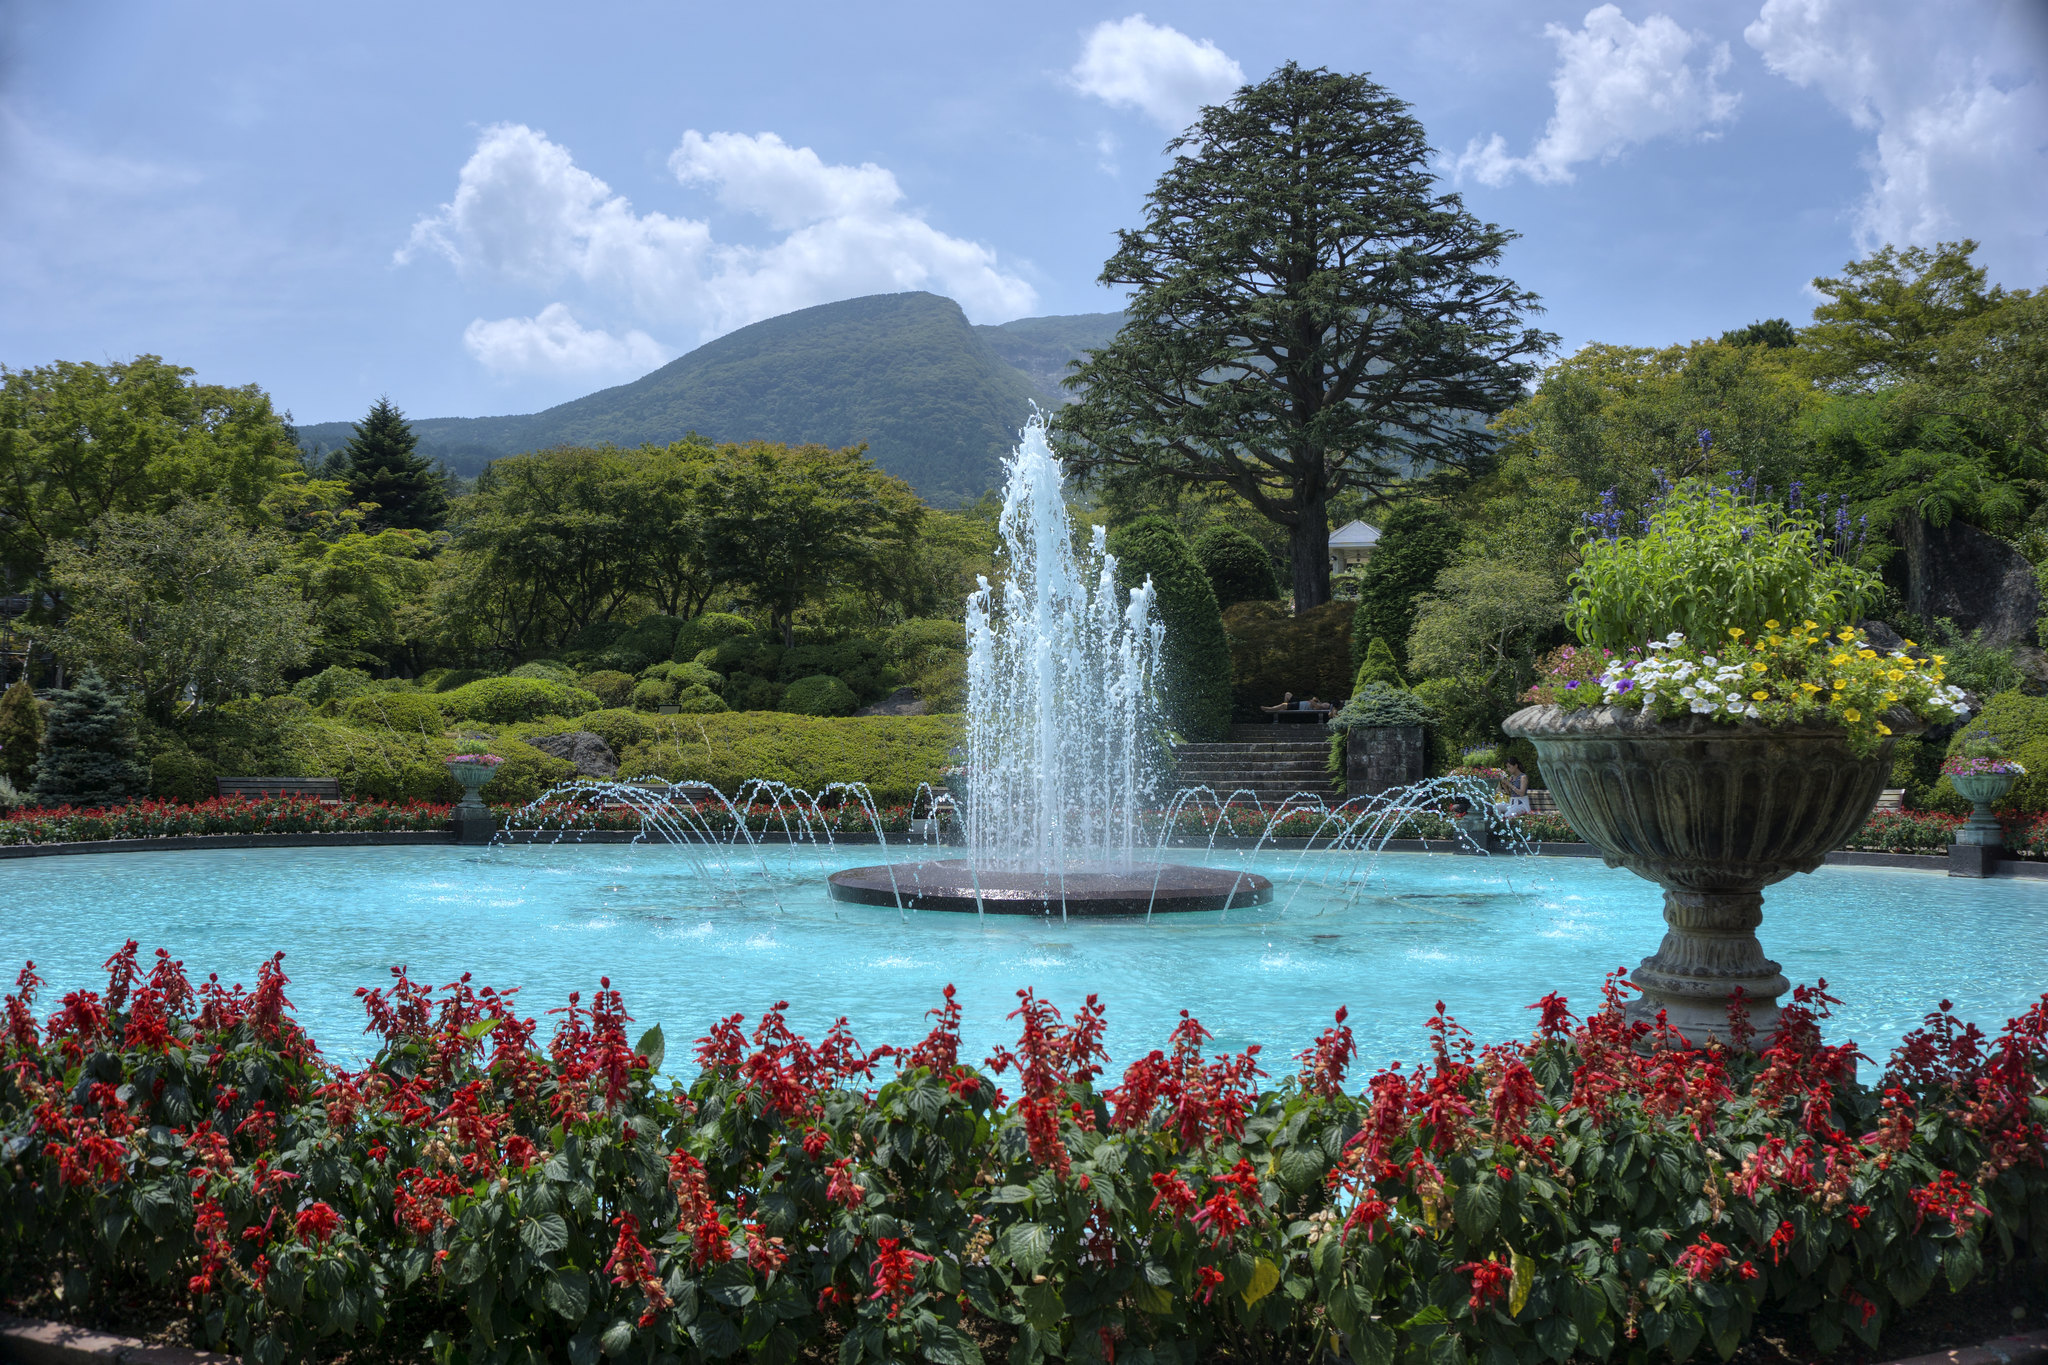 10 Things to do in Hakone, Japan 6